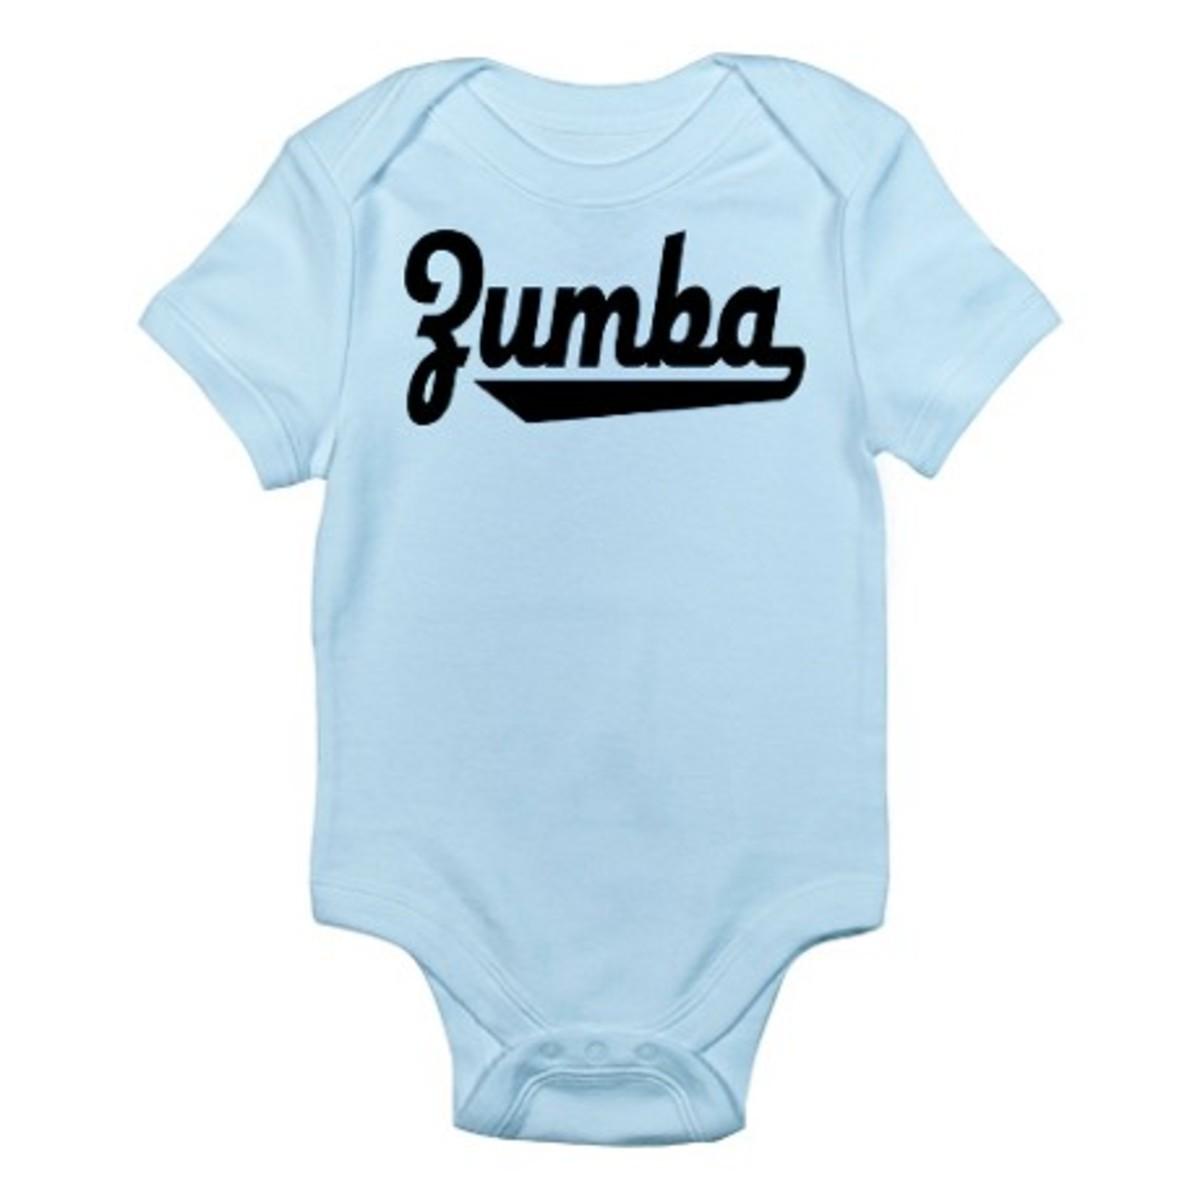 zumba_body_suit